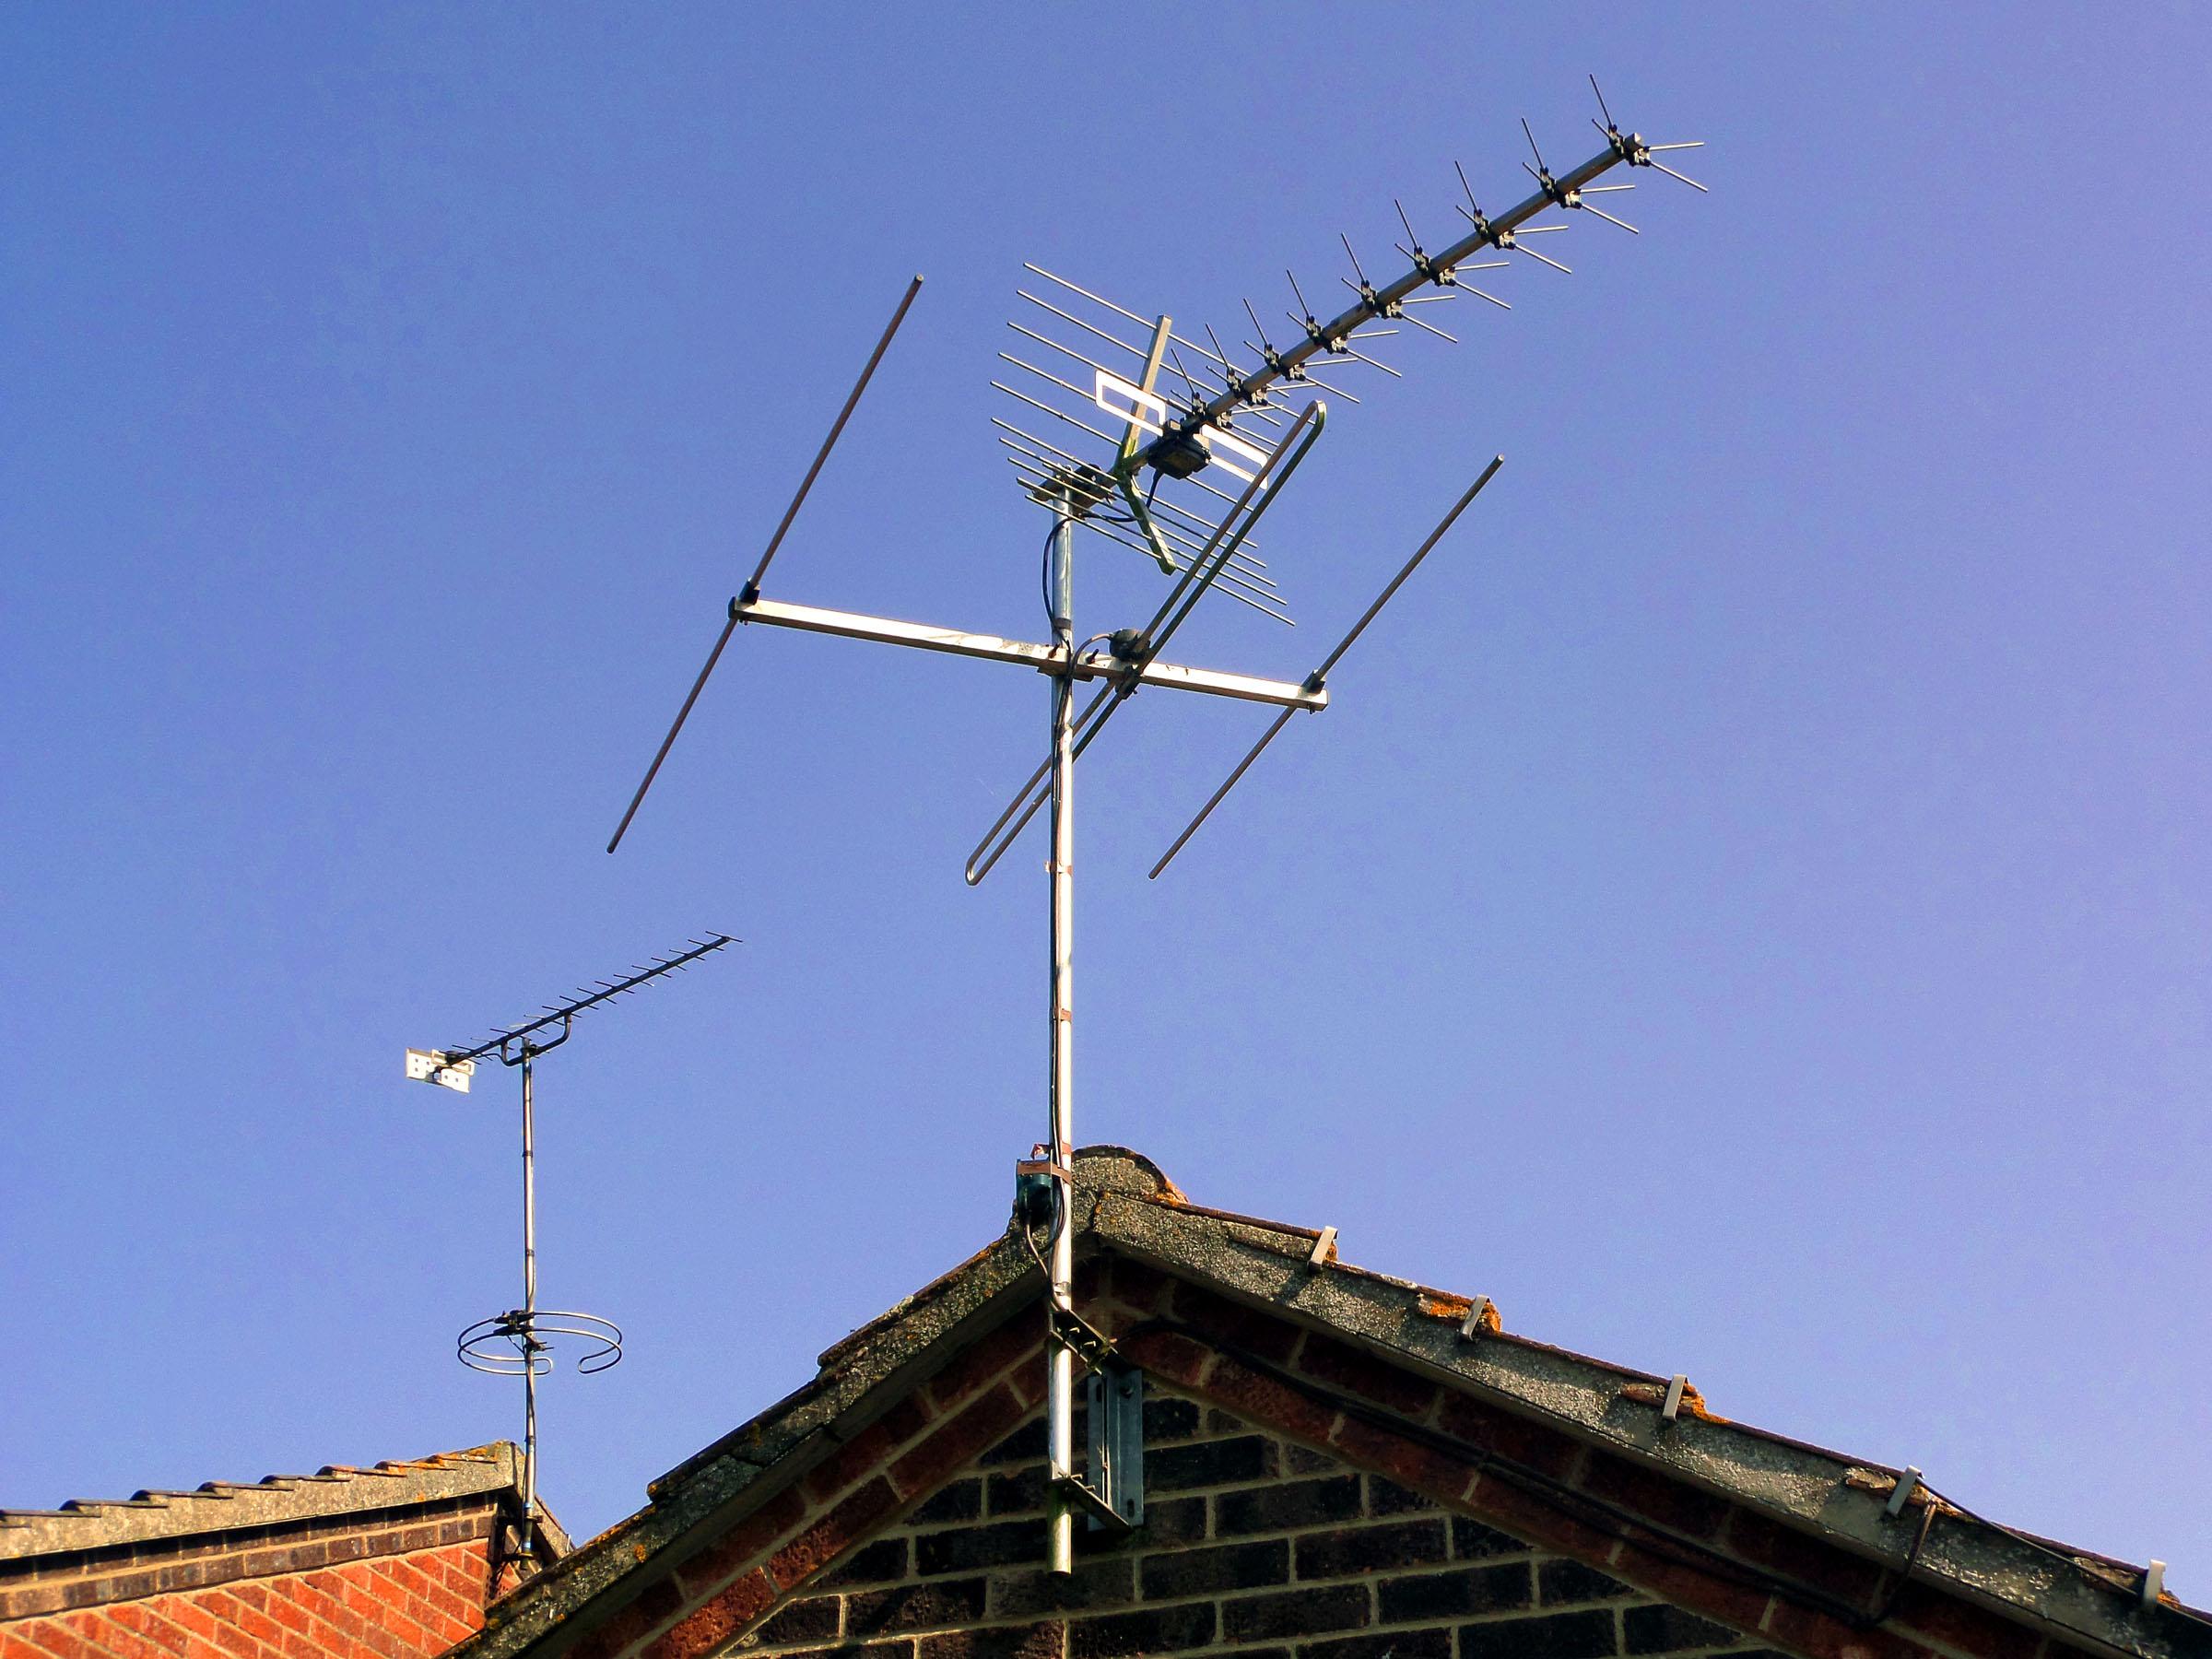 Rooftop Antennae, Antenna, Antennae, Antennas, Reception, HQ Photo